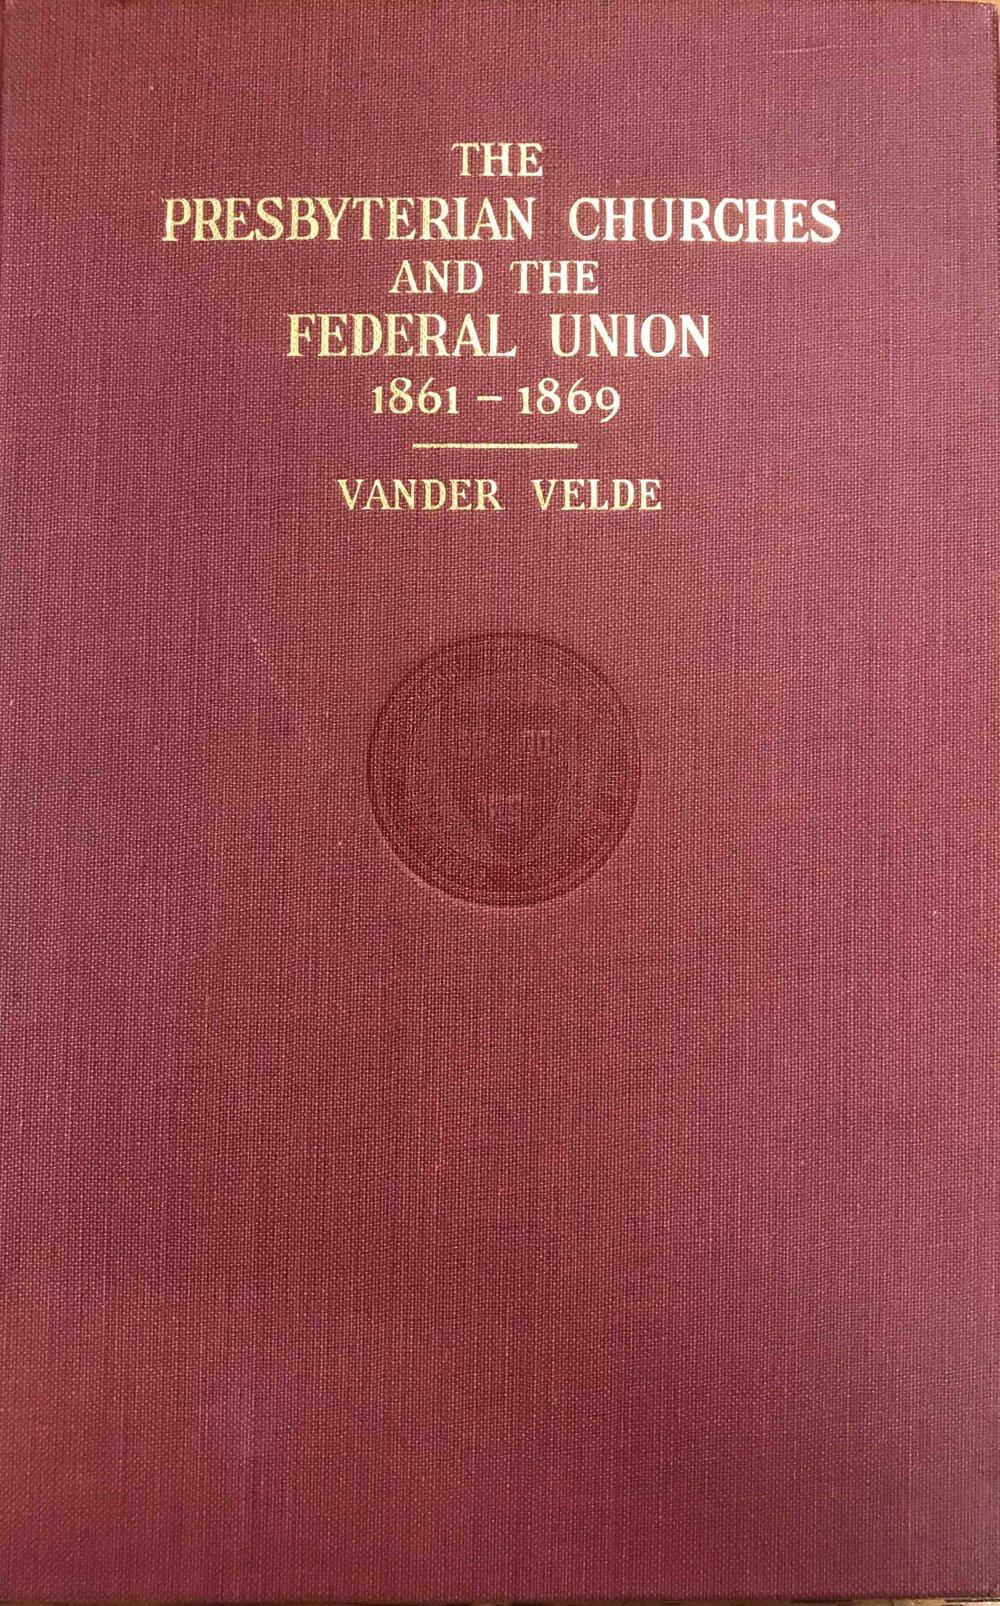 Vander Velde, Presbyterian Churches and Federal Union.jpg